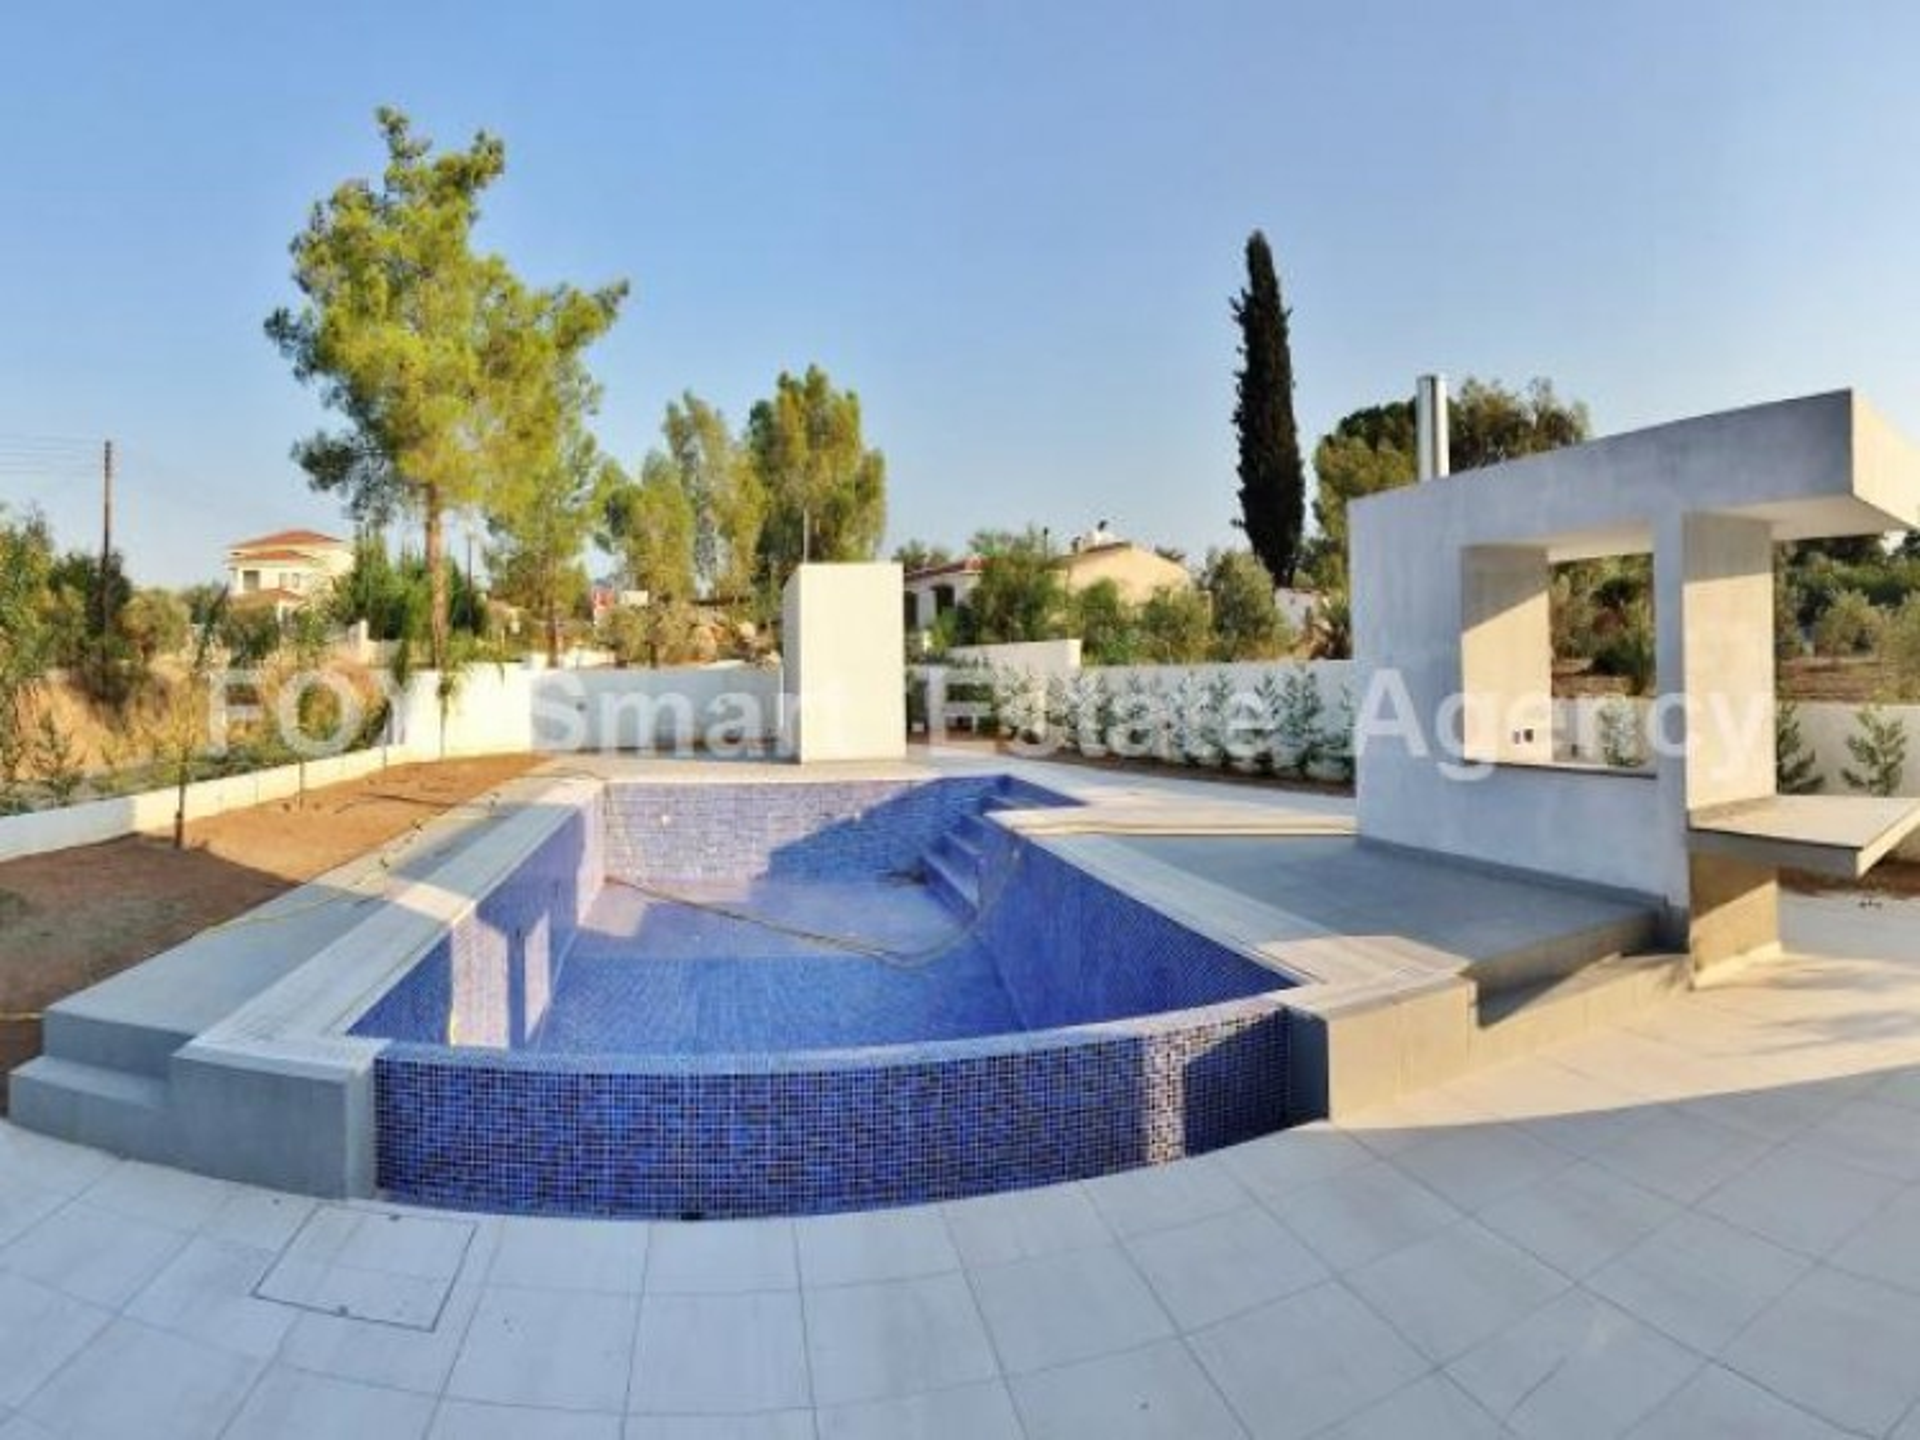 For Sale 5 Bedroom Detached House in Nicosia suburbs, Nicosia